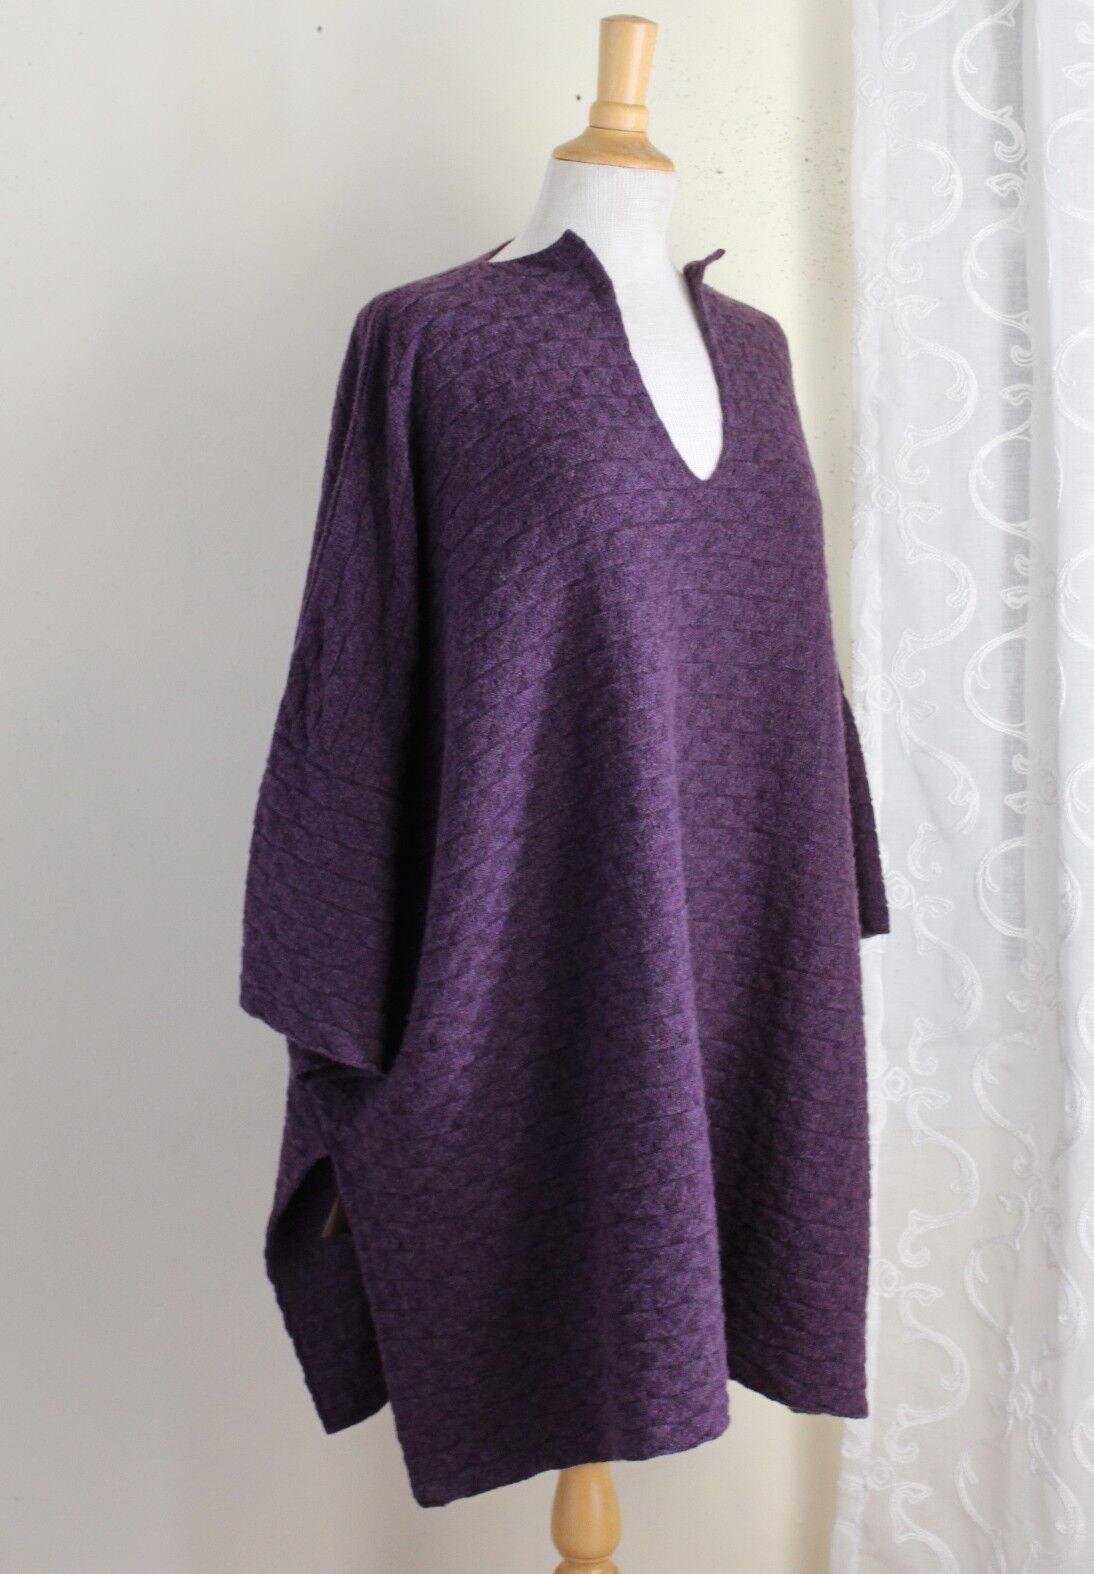 NEW Eskandar PURPLE Poncho 32 LONG Boxy 100% Cashmere Tunic Sweater O S